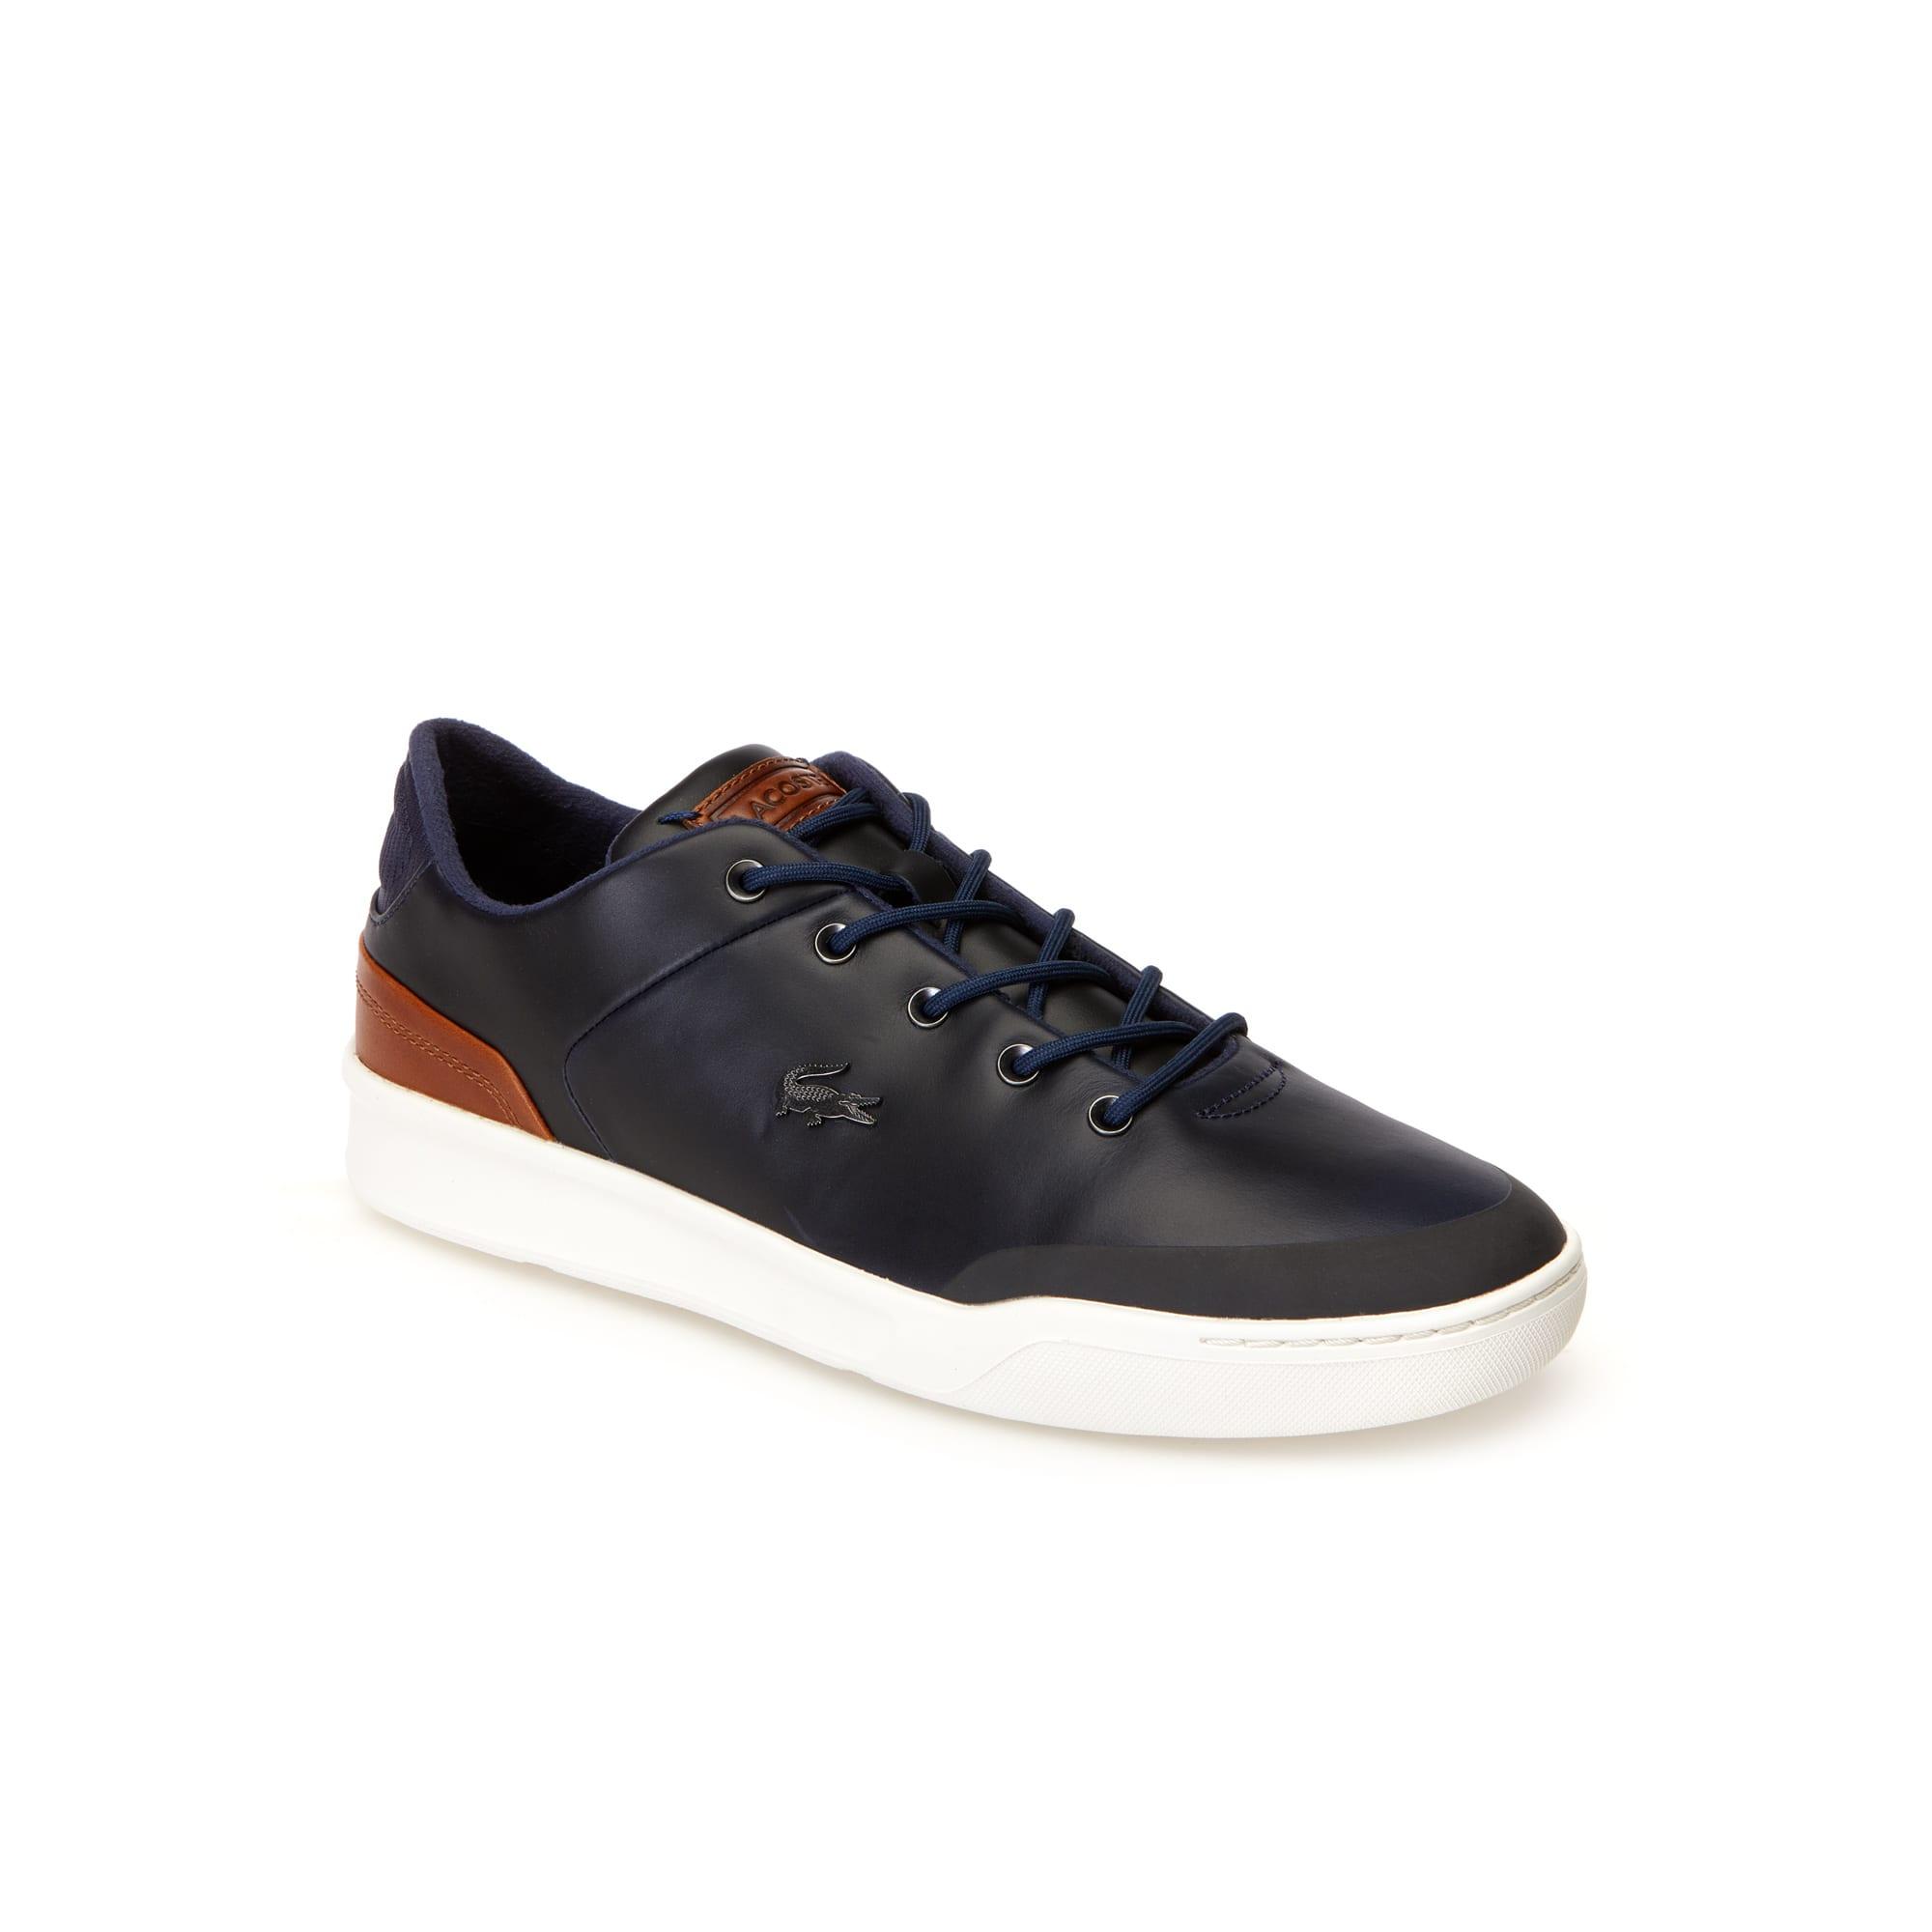 Herren-Sneakers EXPLORATEUR CLASSIC L aus Anilinleder